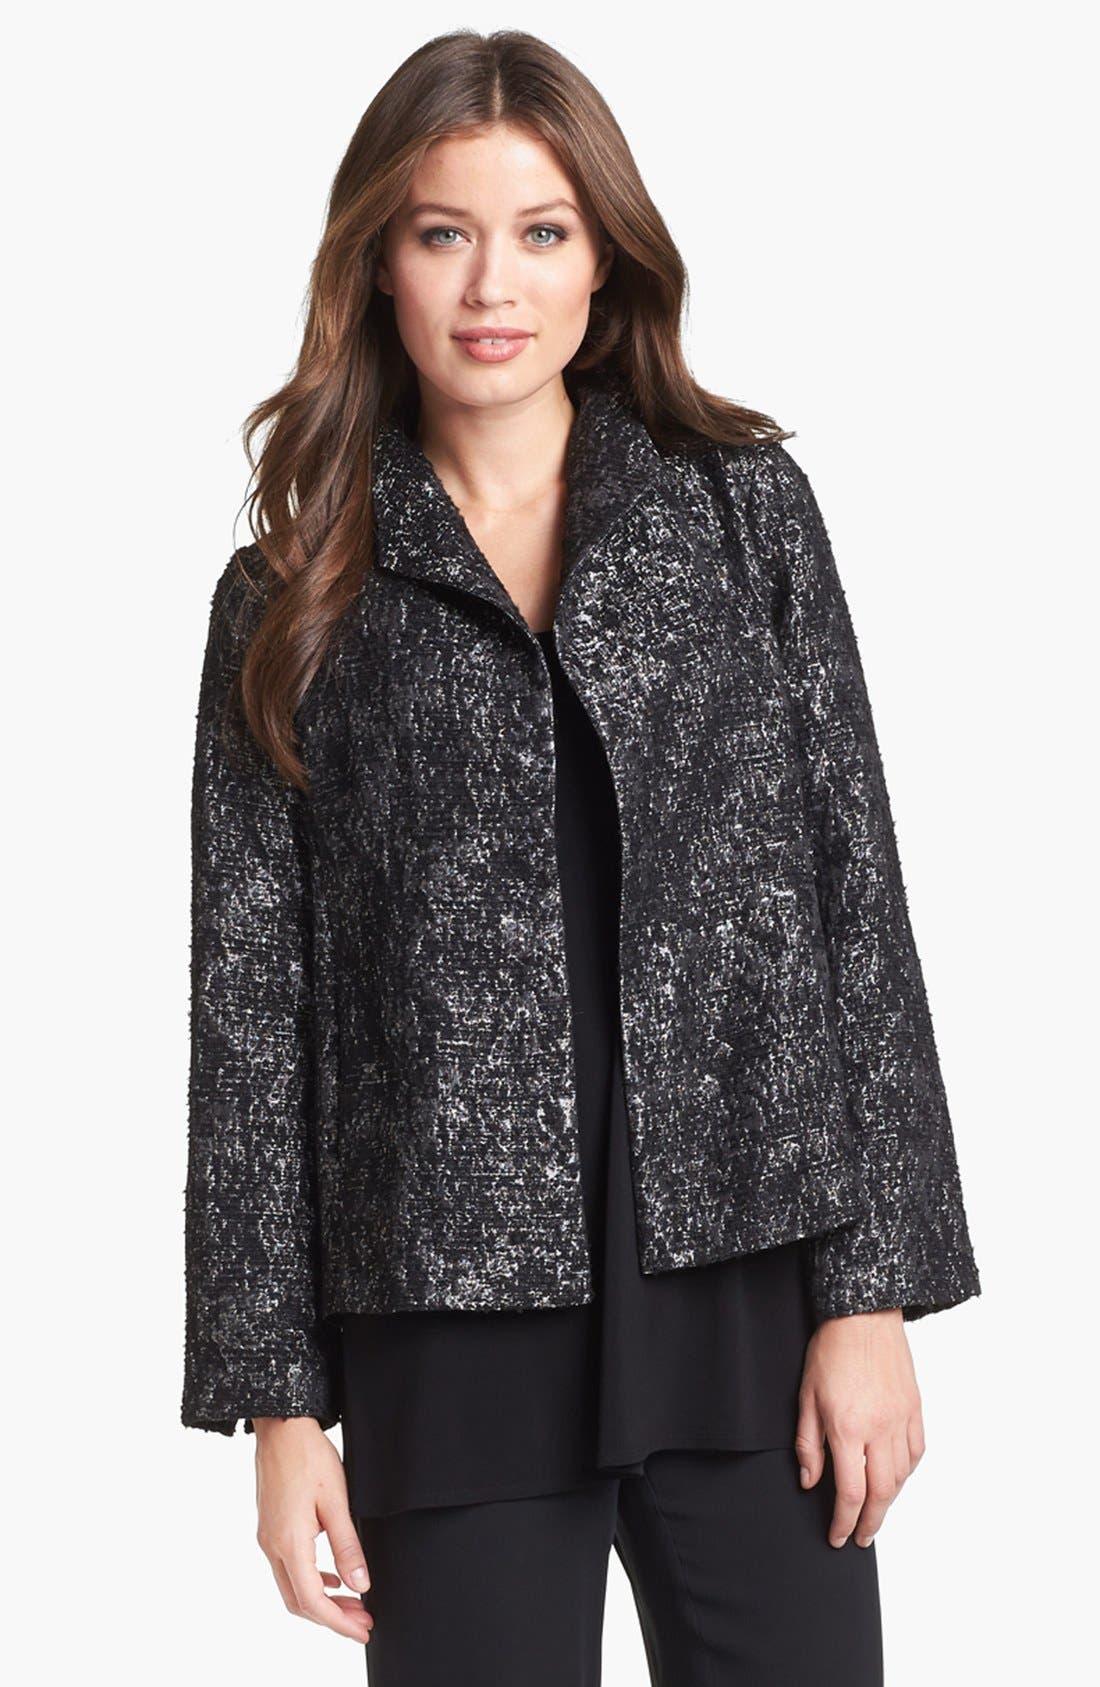 Alternate Image 1 Selected - Eileen Fisher Threaded Satin Jacquard Jacket